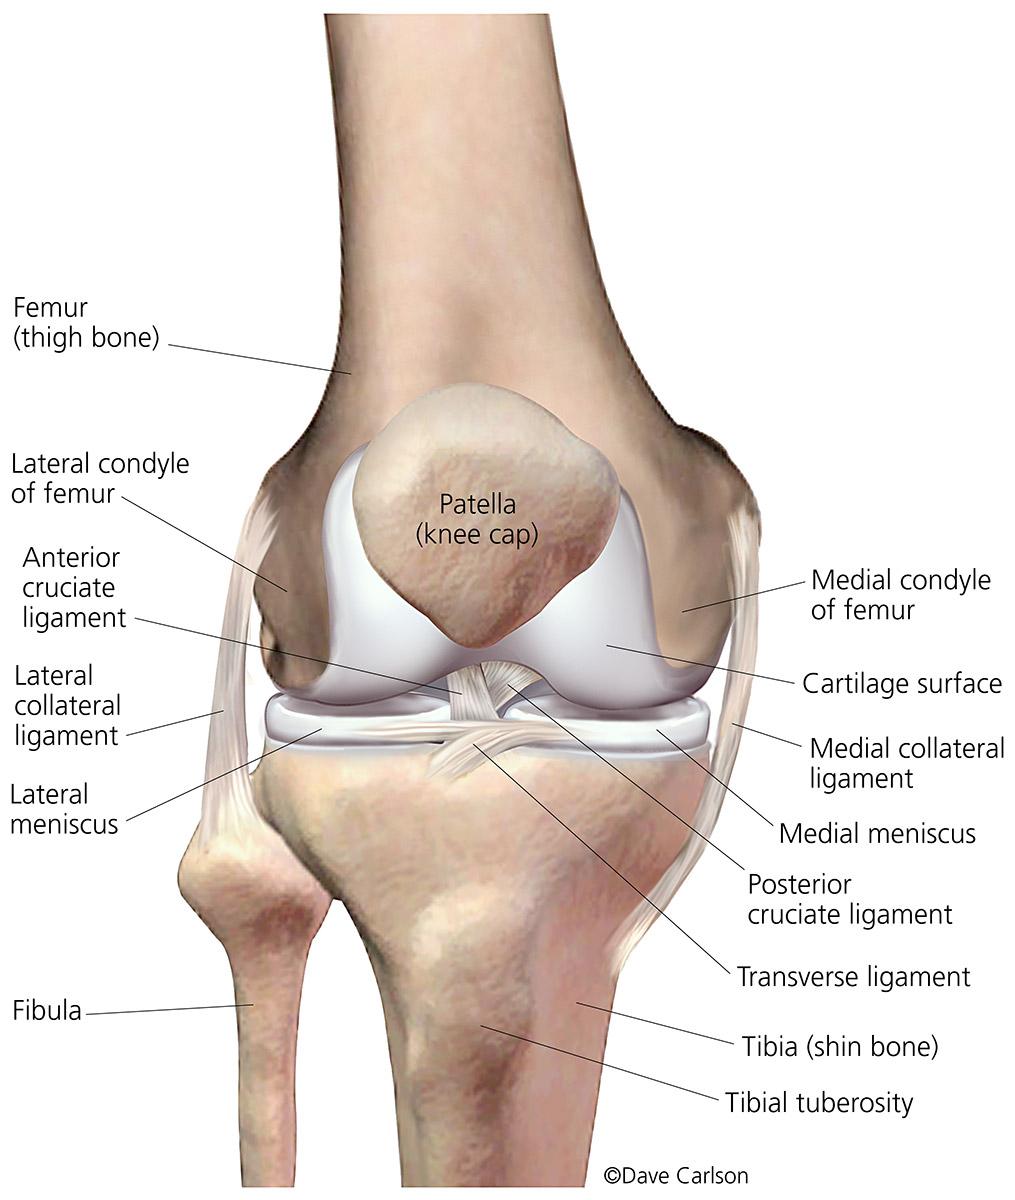 hight resolution of illustration bones ligaments cartilage menisci right knee front view